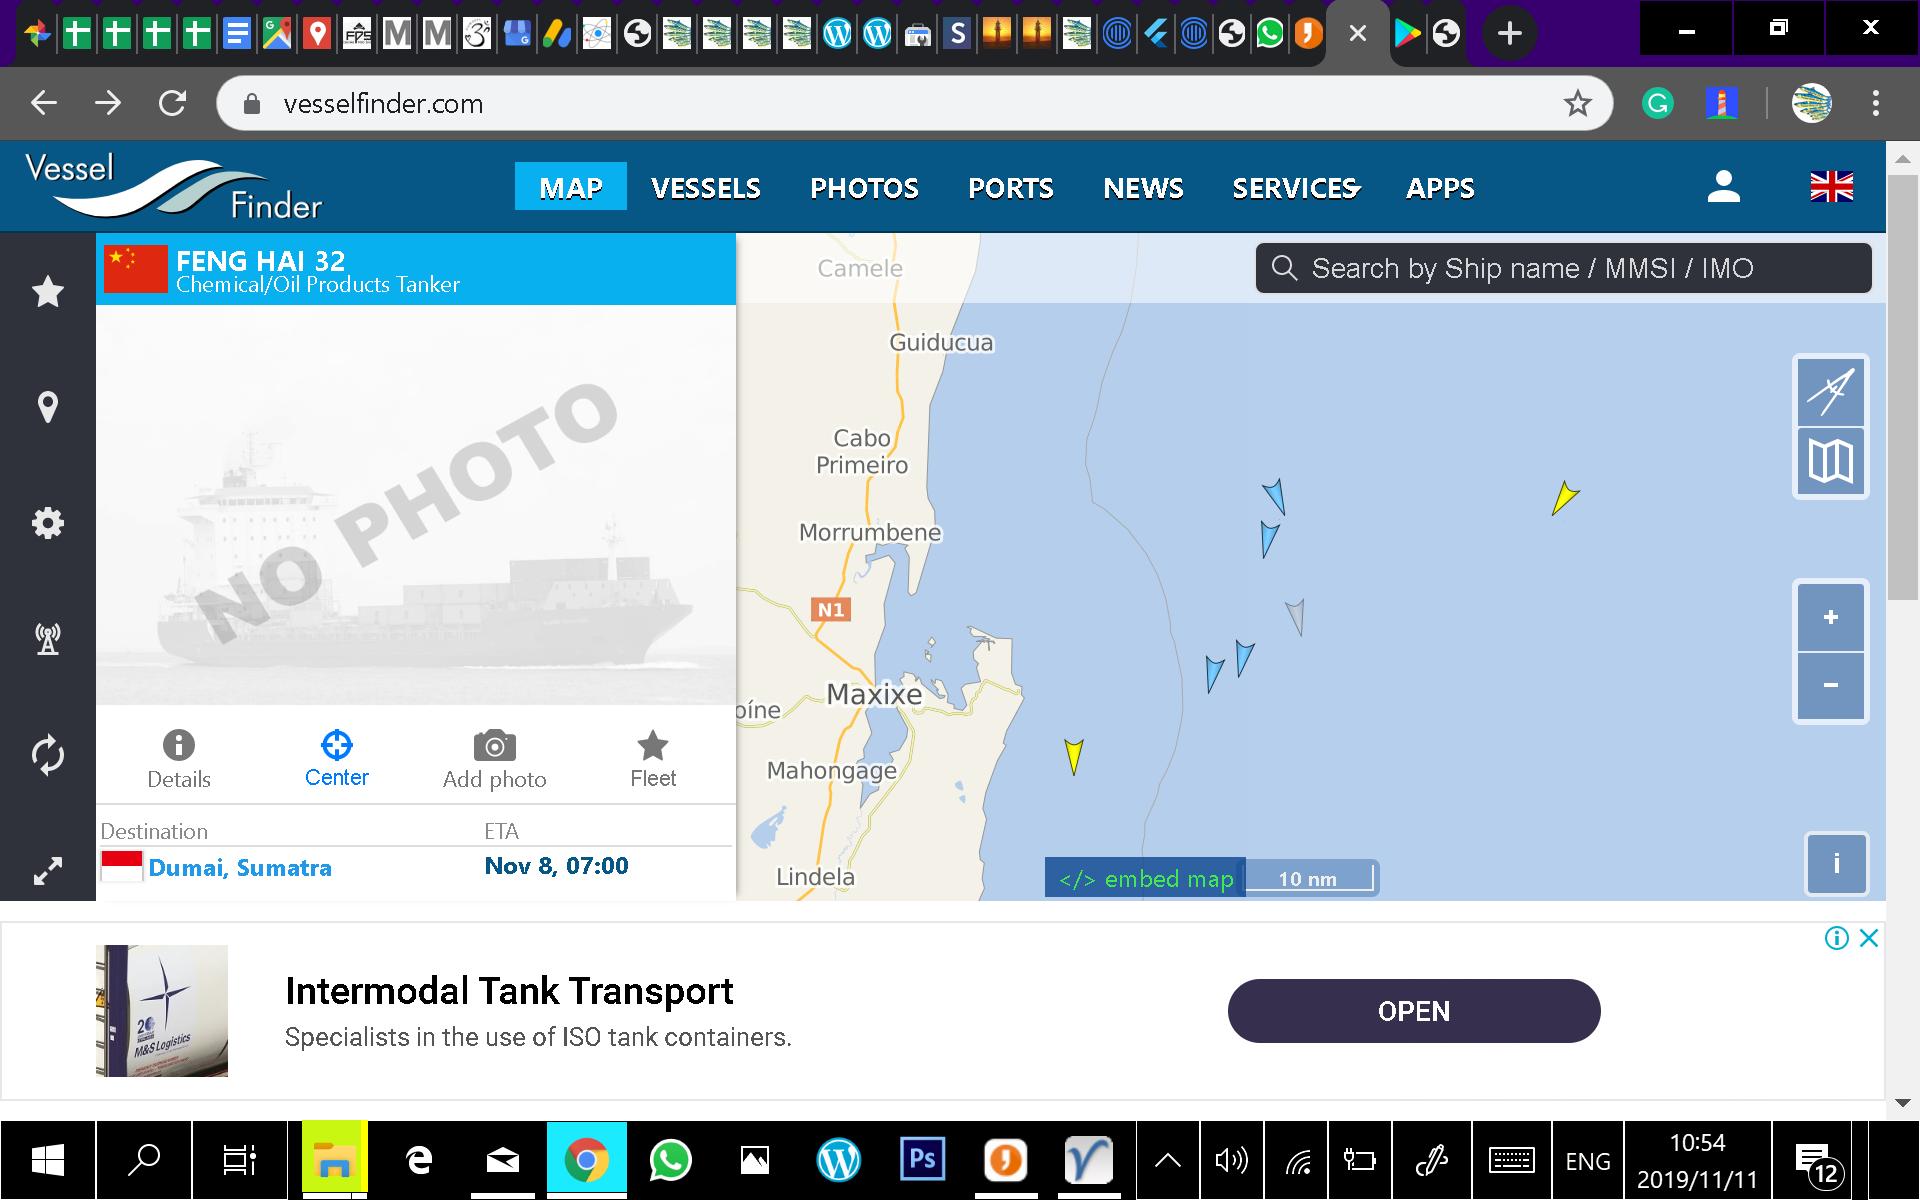 Vesselfinder screen shot of fishing vessels fishing close together of Xai Xai